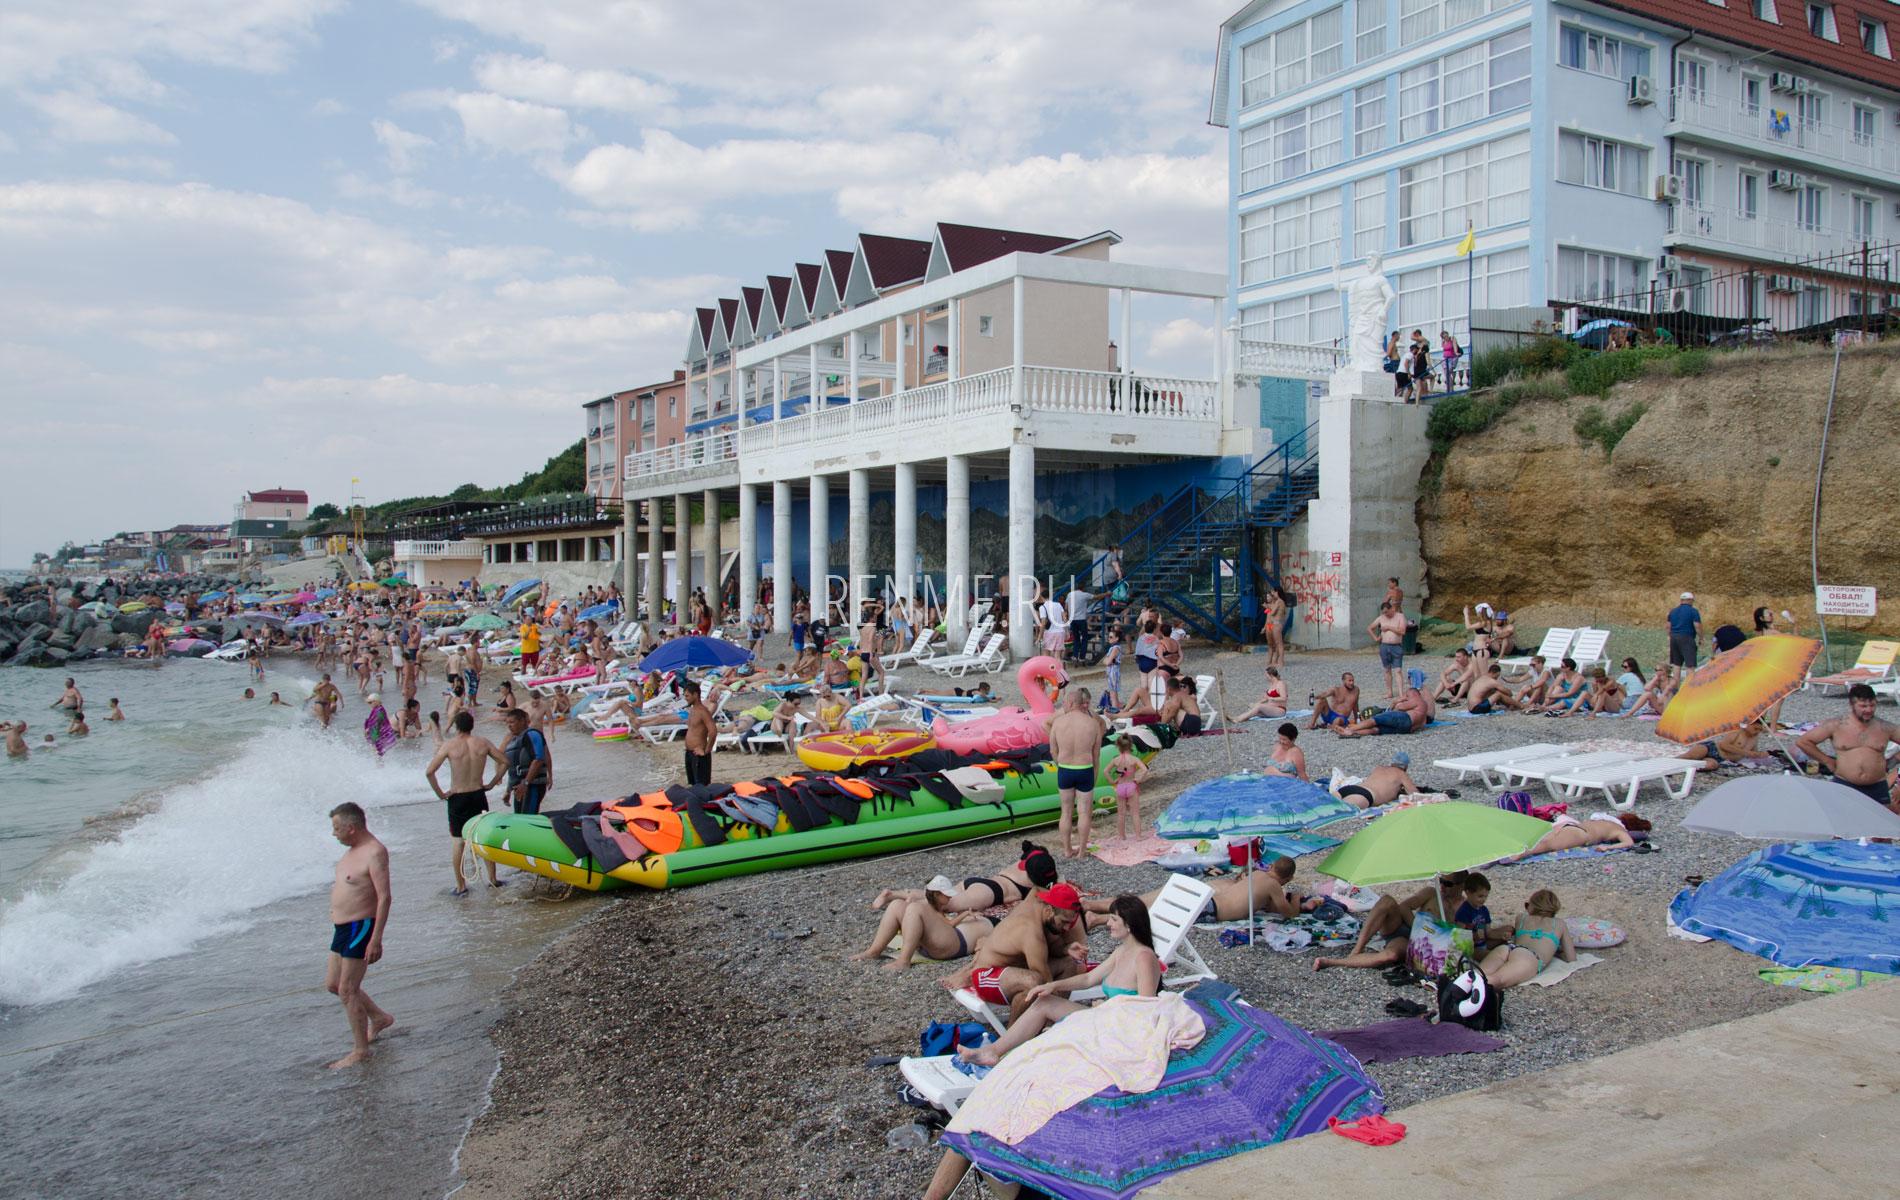 Пляж с удобствами в июле. Фото Николаевки